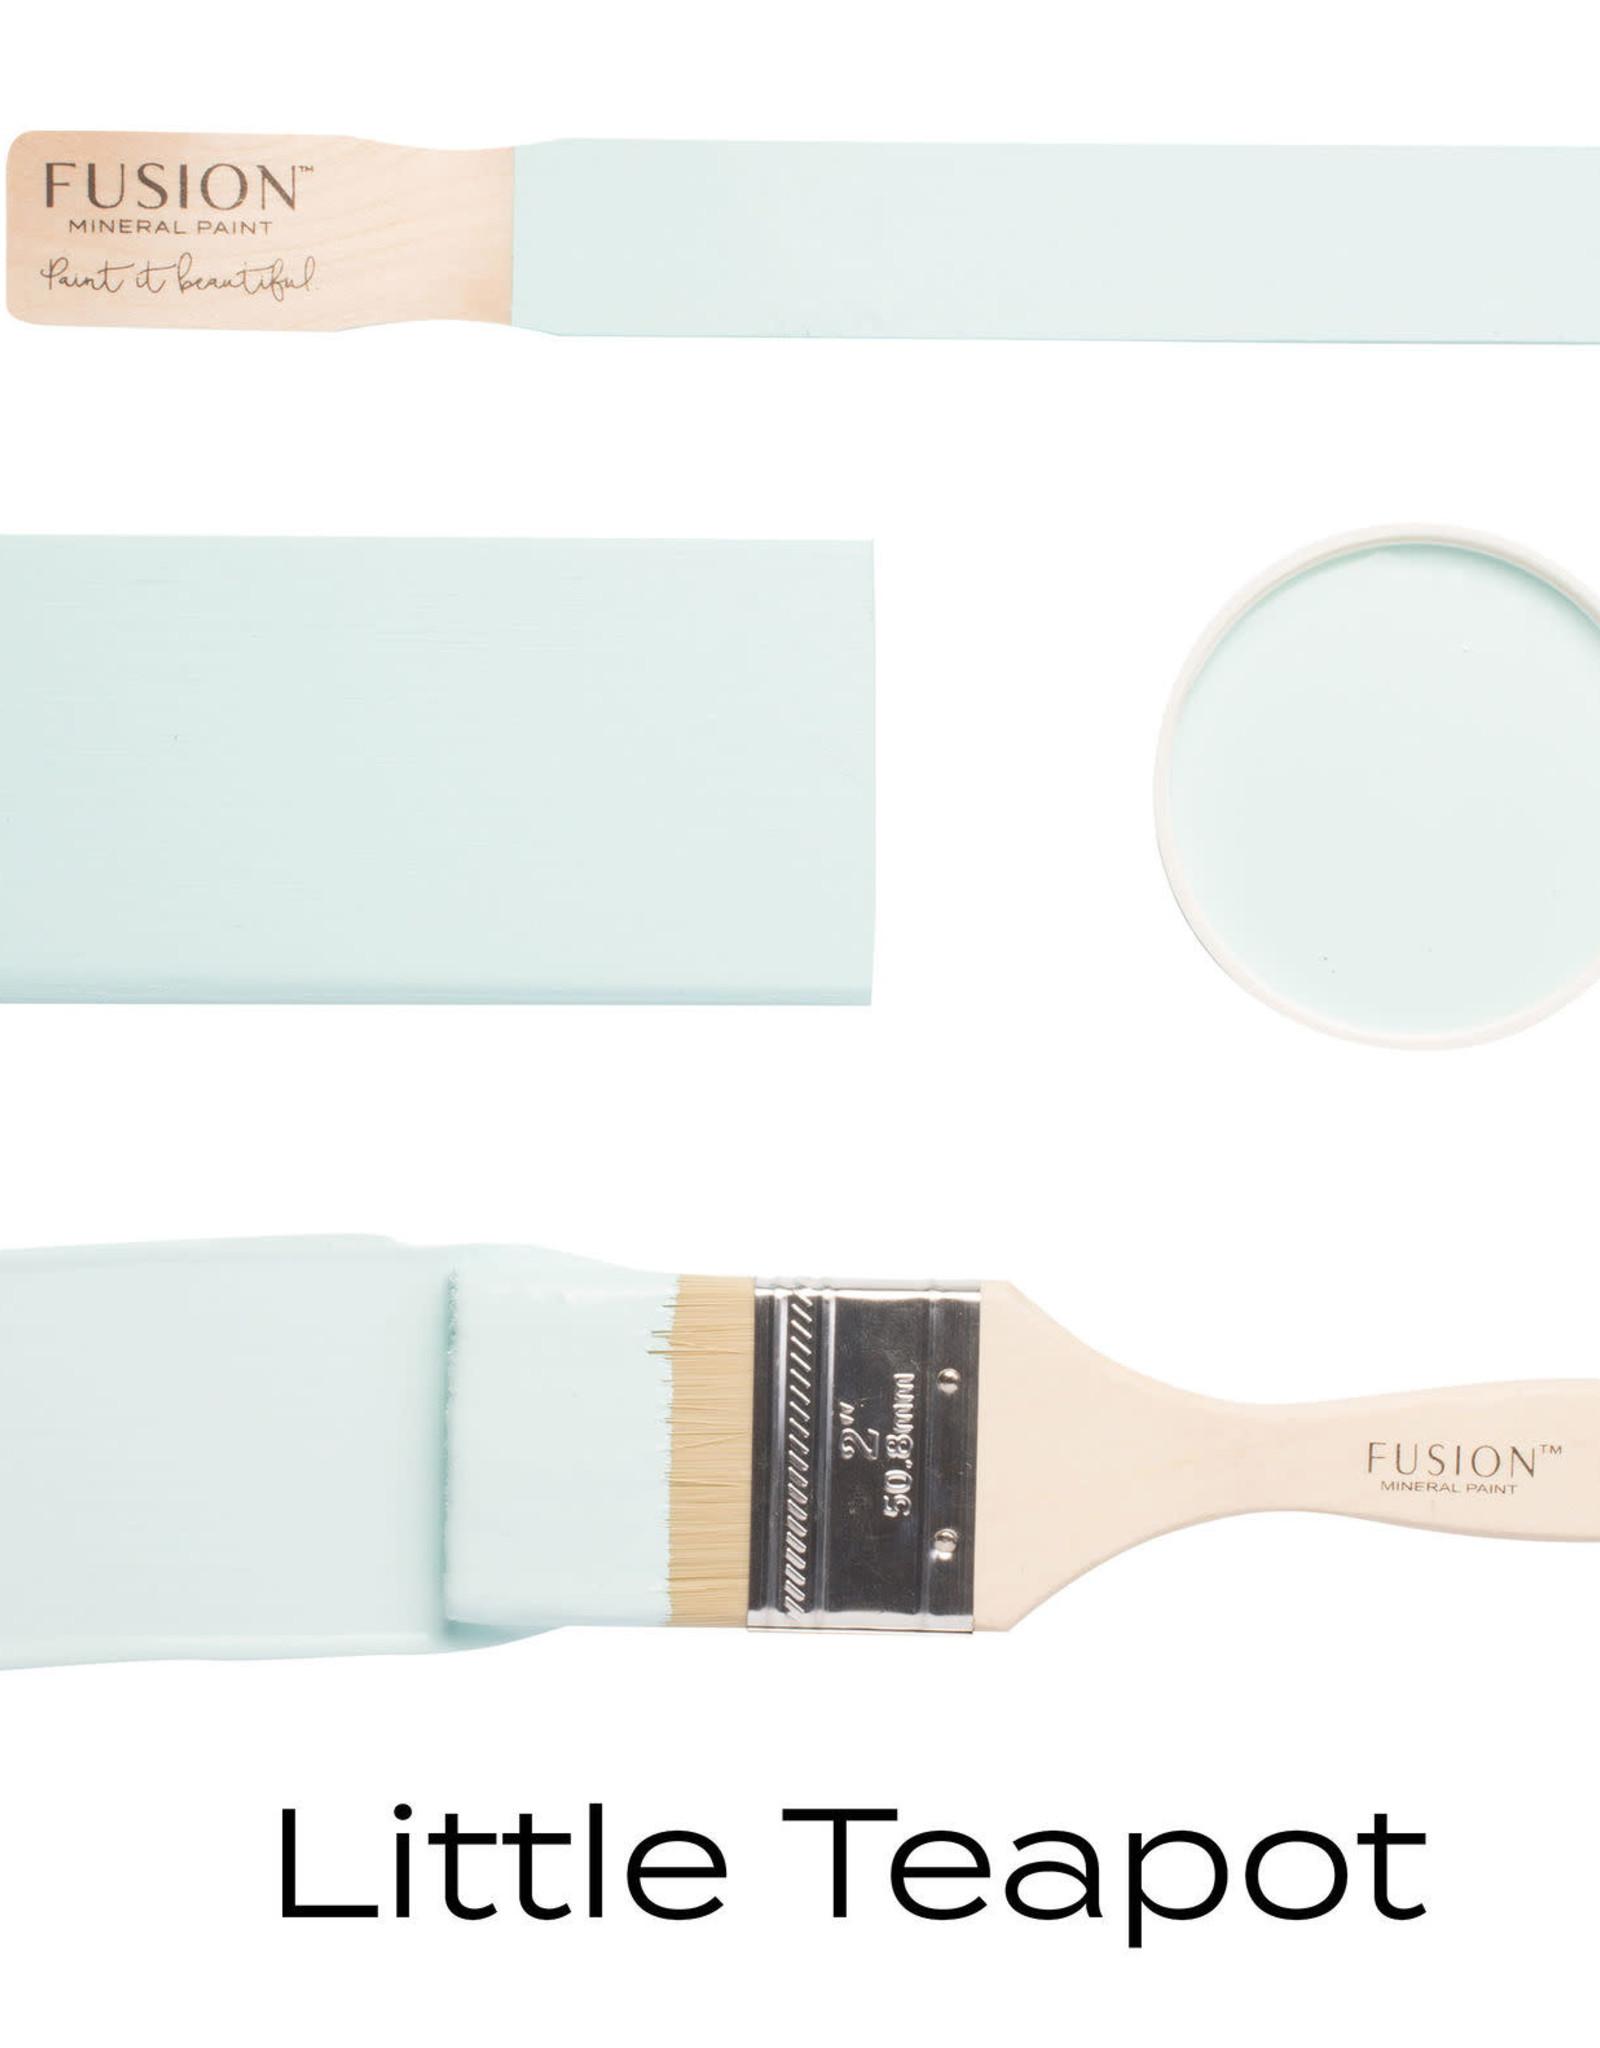 Fusion Mineral Paint Fusion Mineral Paint - Little Teapot 500ml